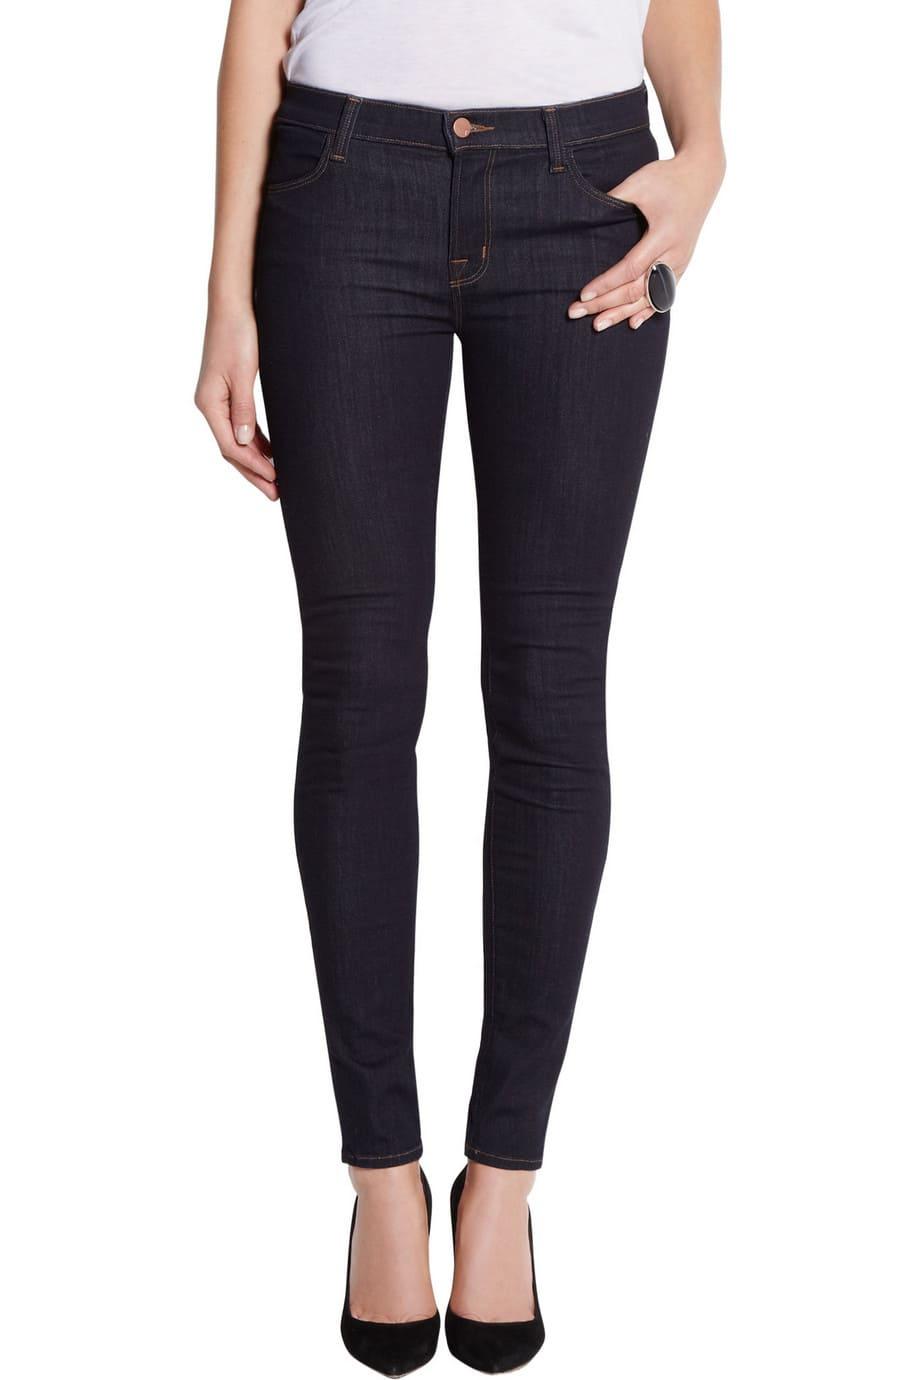 image Arborer le look de (Black Widow) Natasha Romanoff en jeans J Brand 26